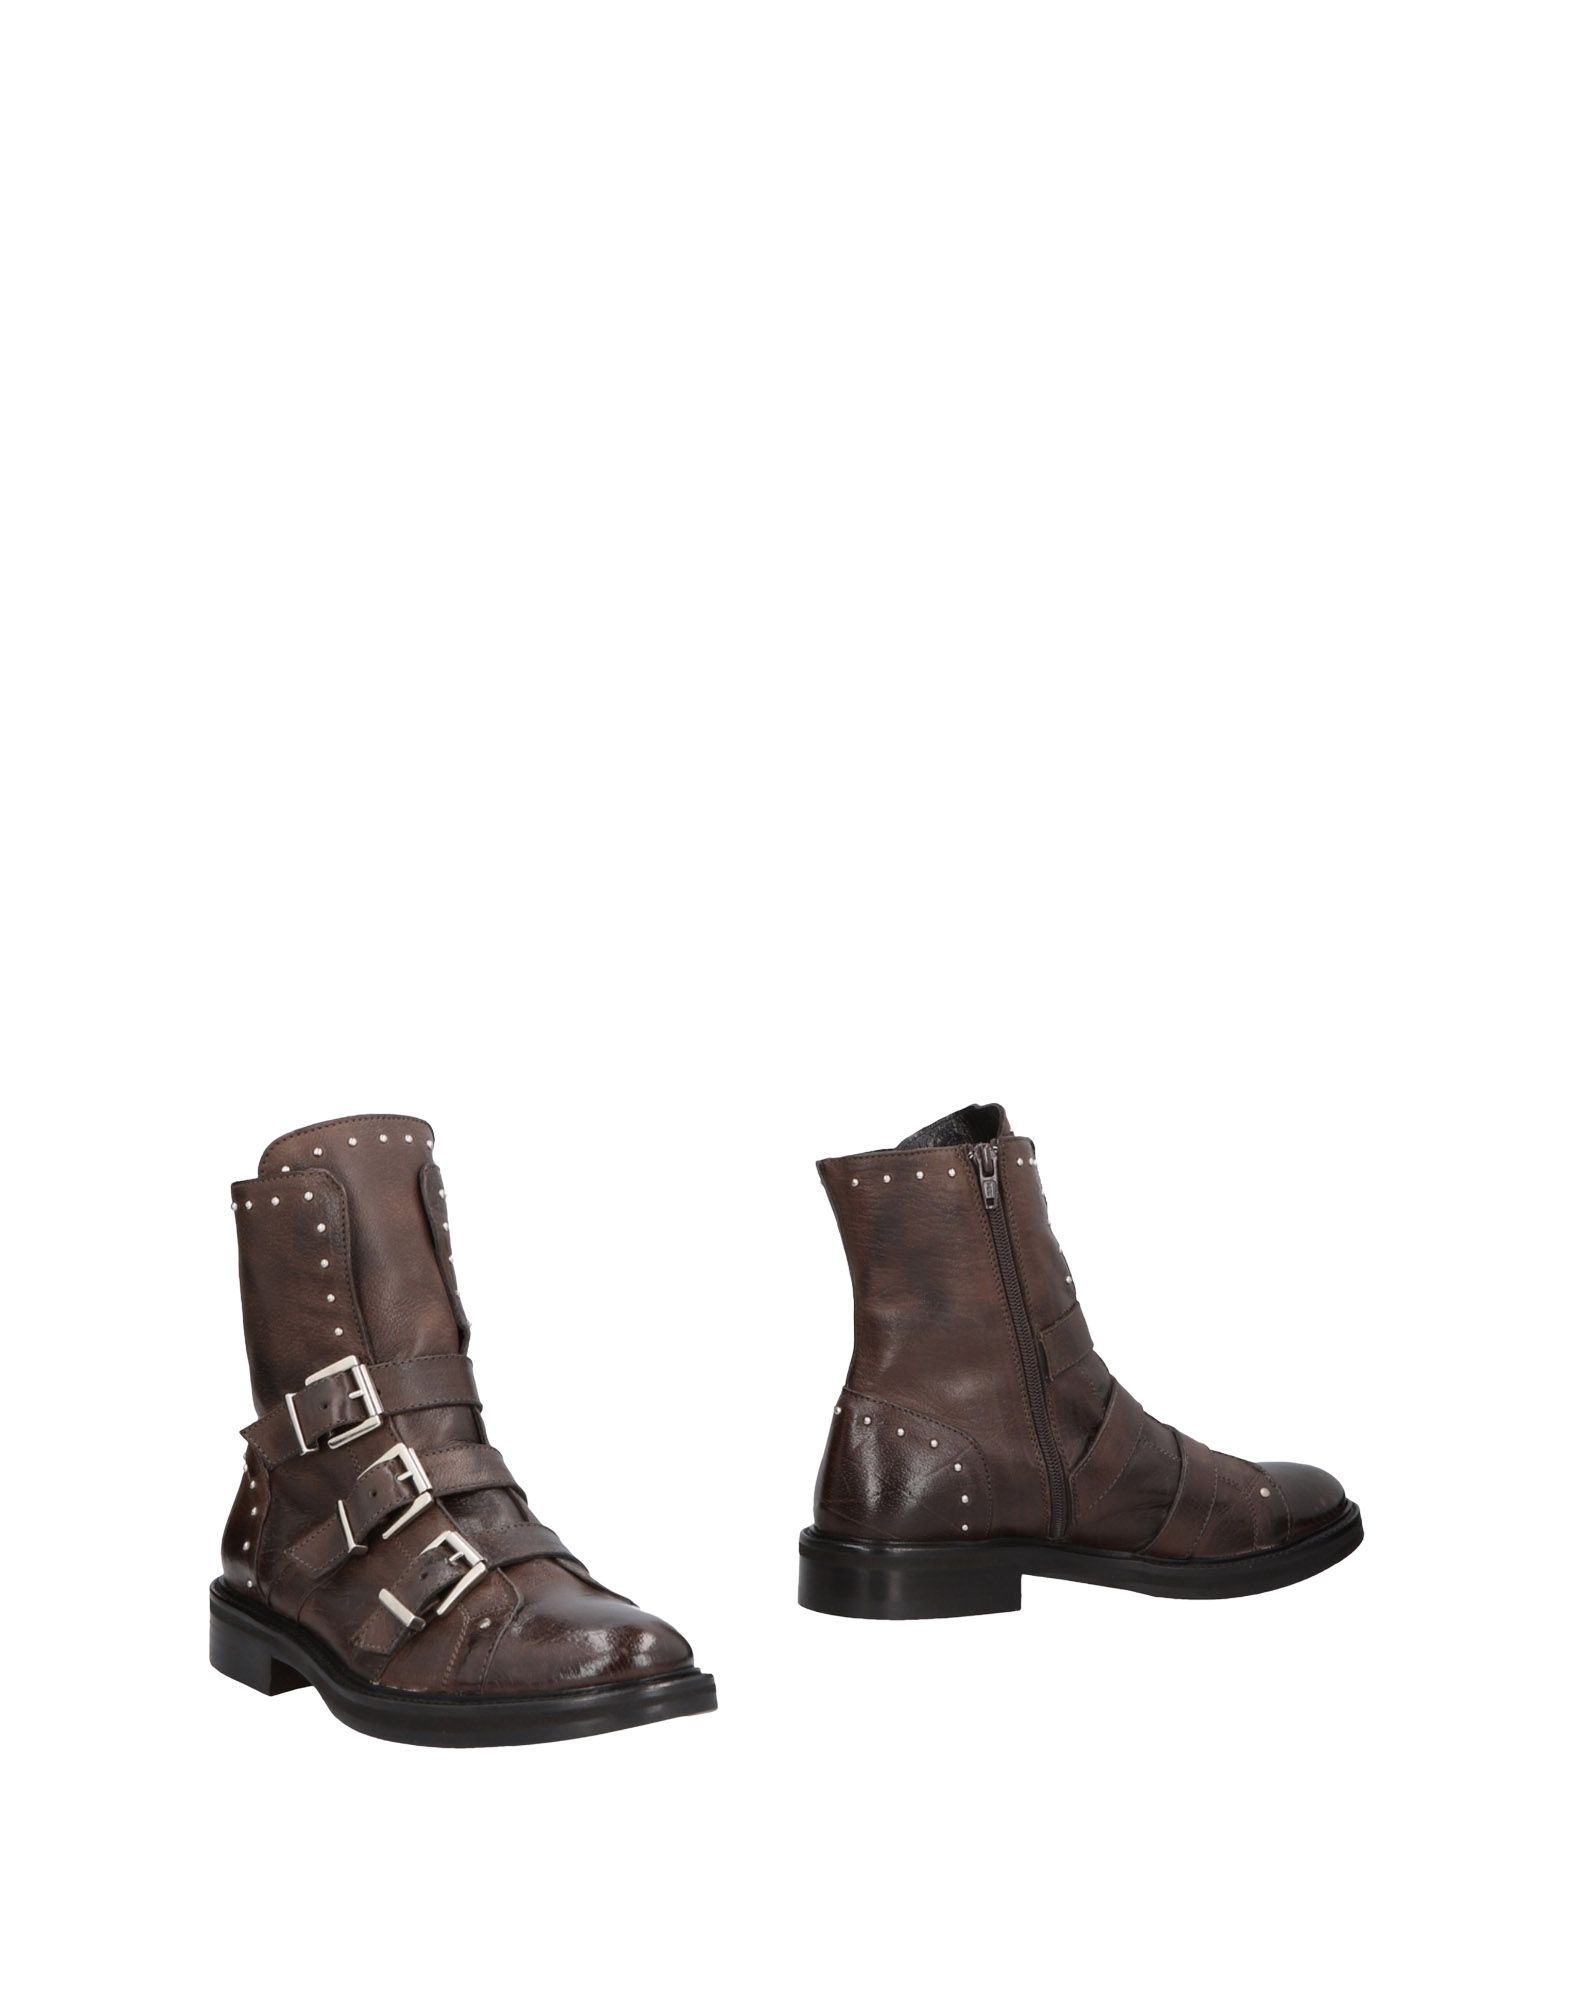 NICOLA BARBATO Полусапоги и высокие ботинки nicola sexton полусапоги и высокие ботинки